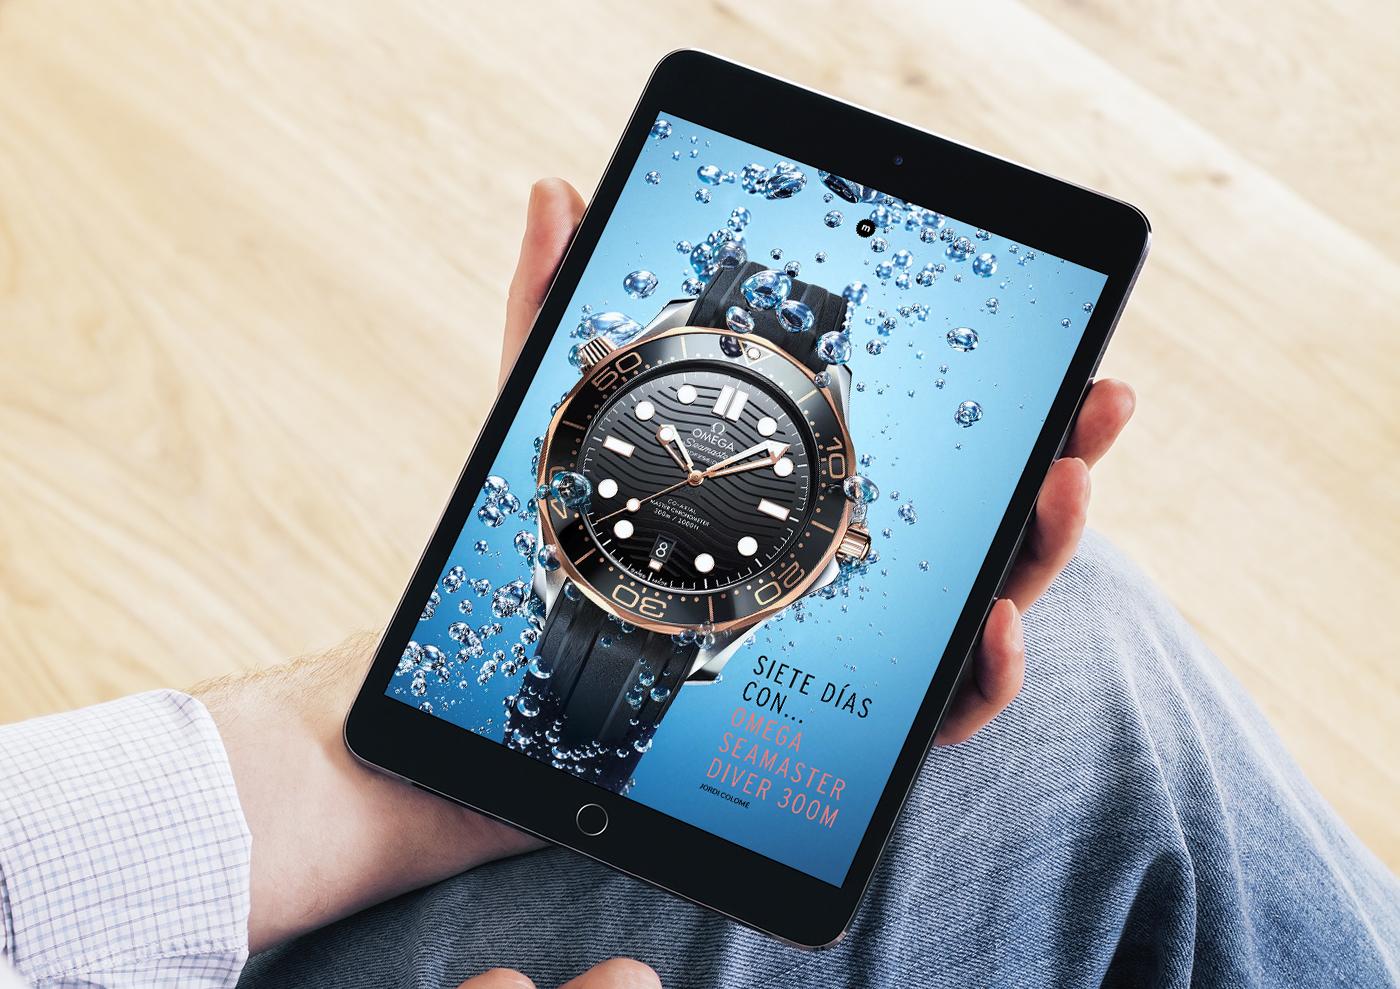 reloj-ipad-revista-creartiva-tablet-pantalla